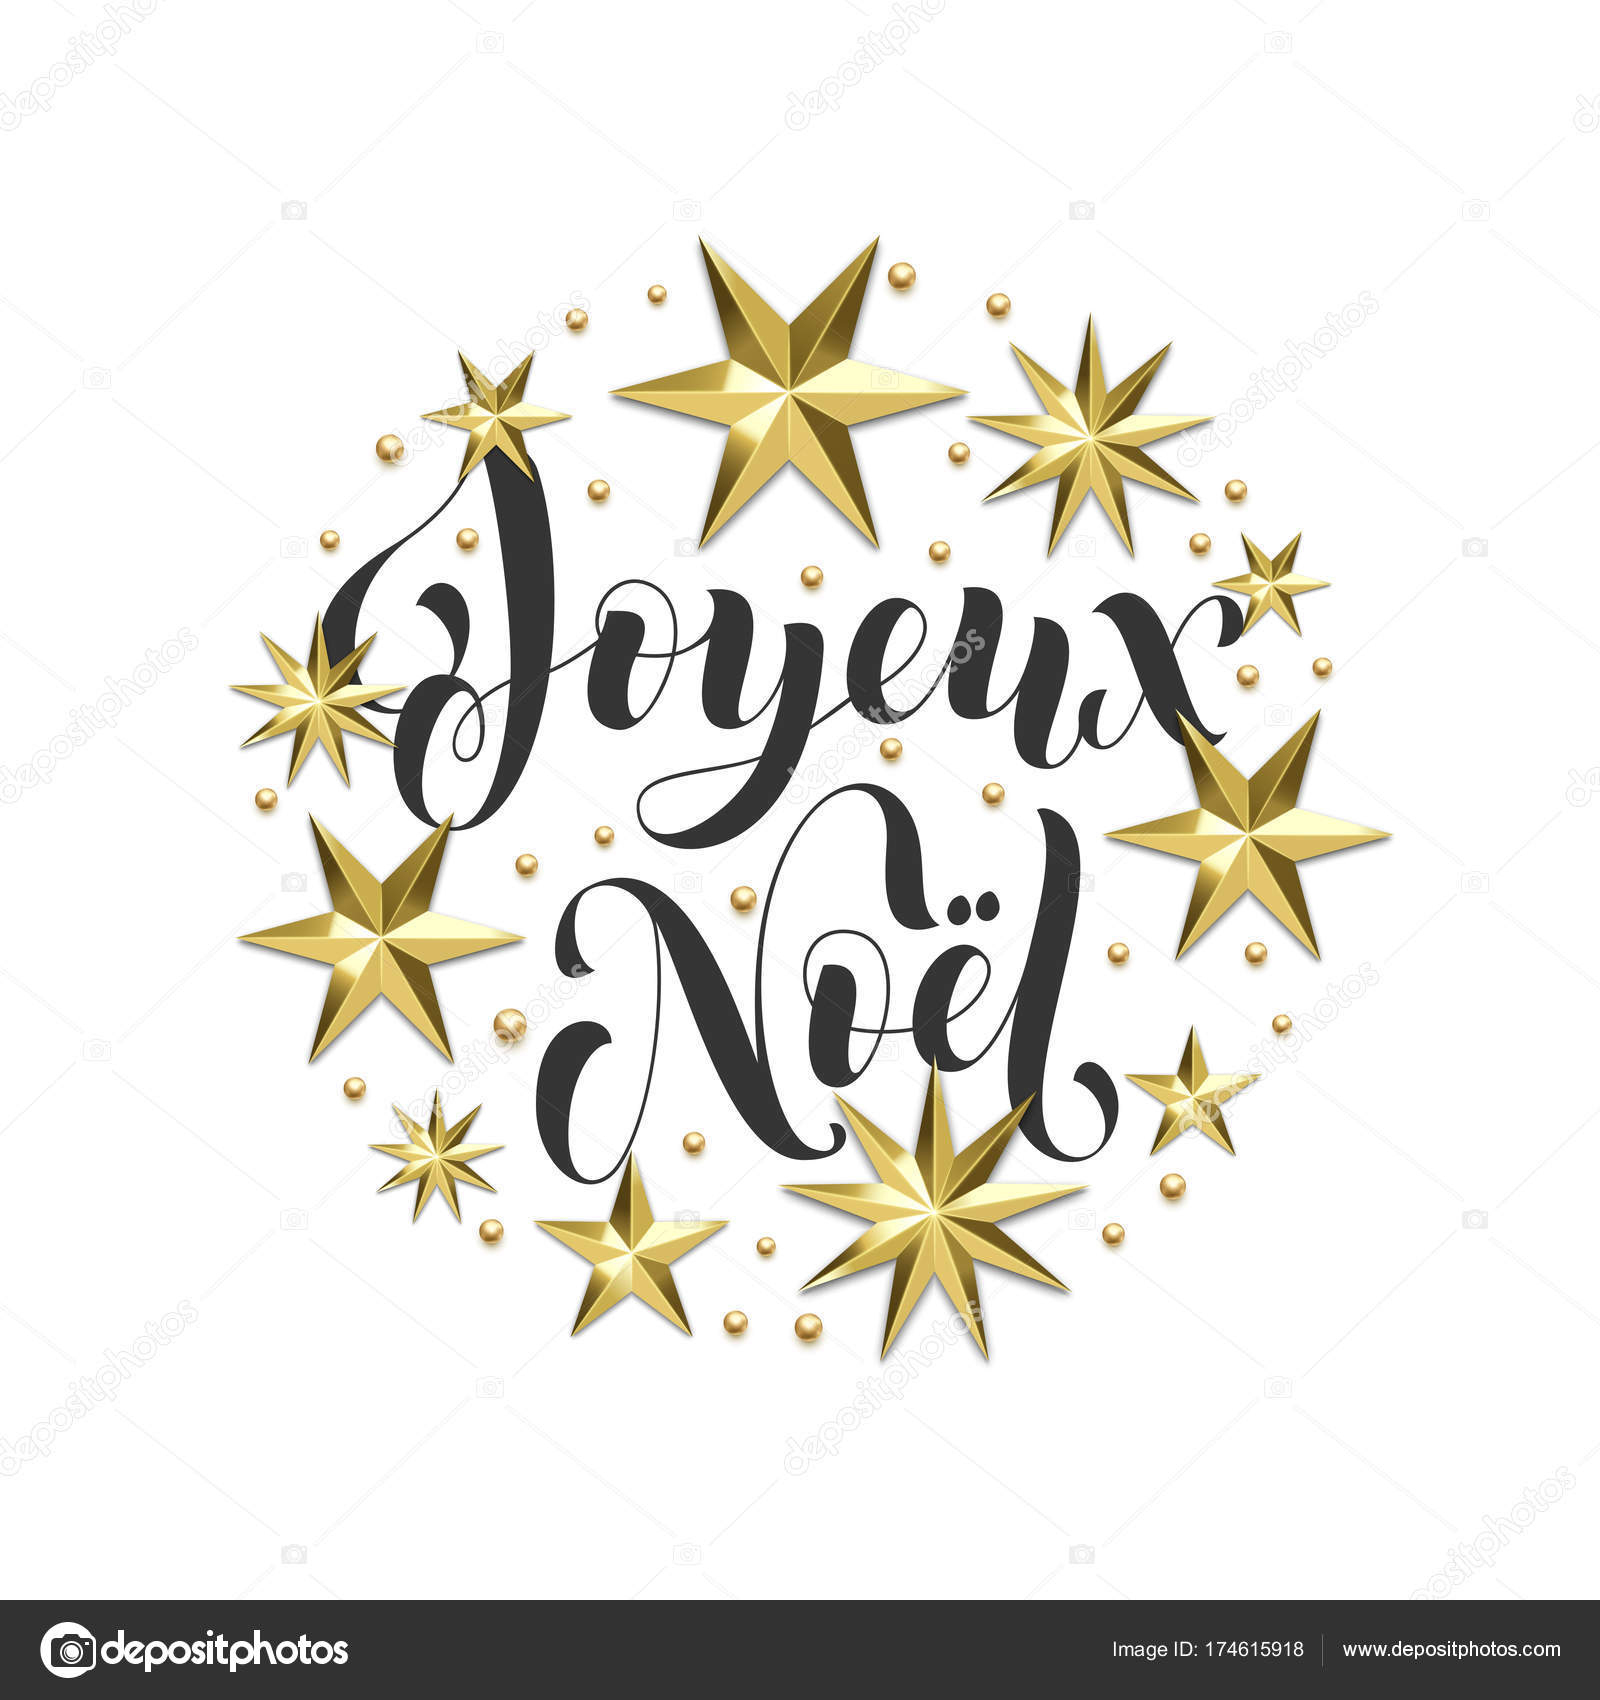 Joyeux Noel French Merry Christmas Golden Decoration concernant Police Ecriture Noel